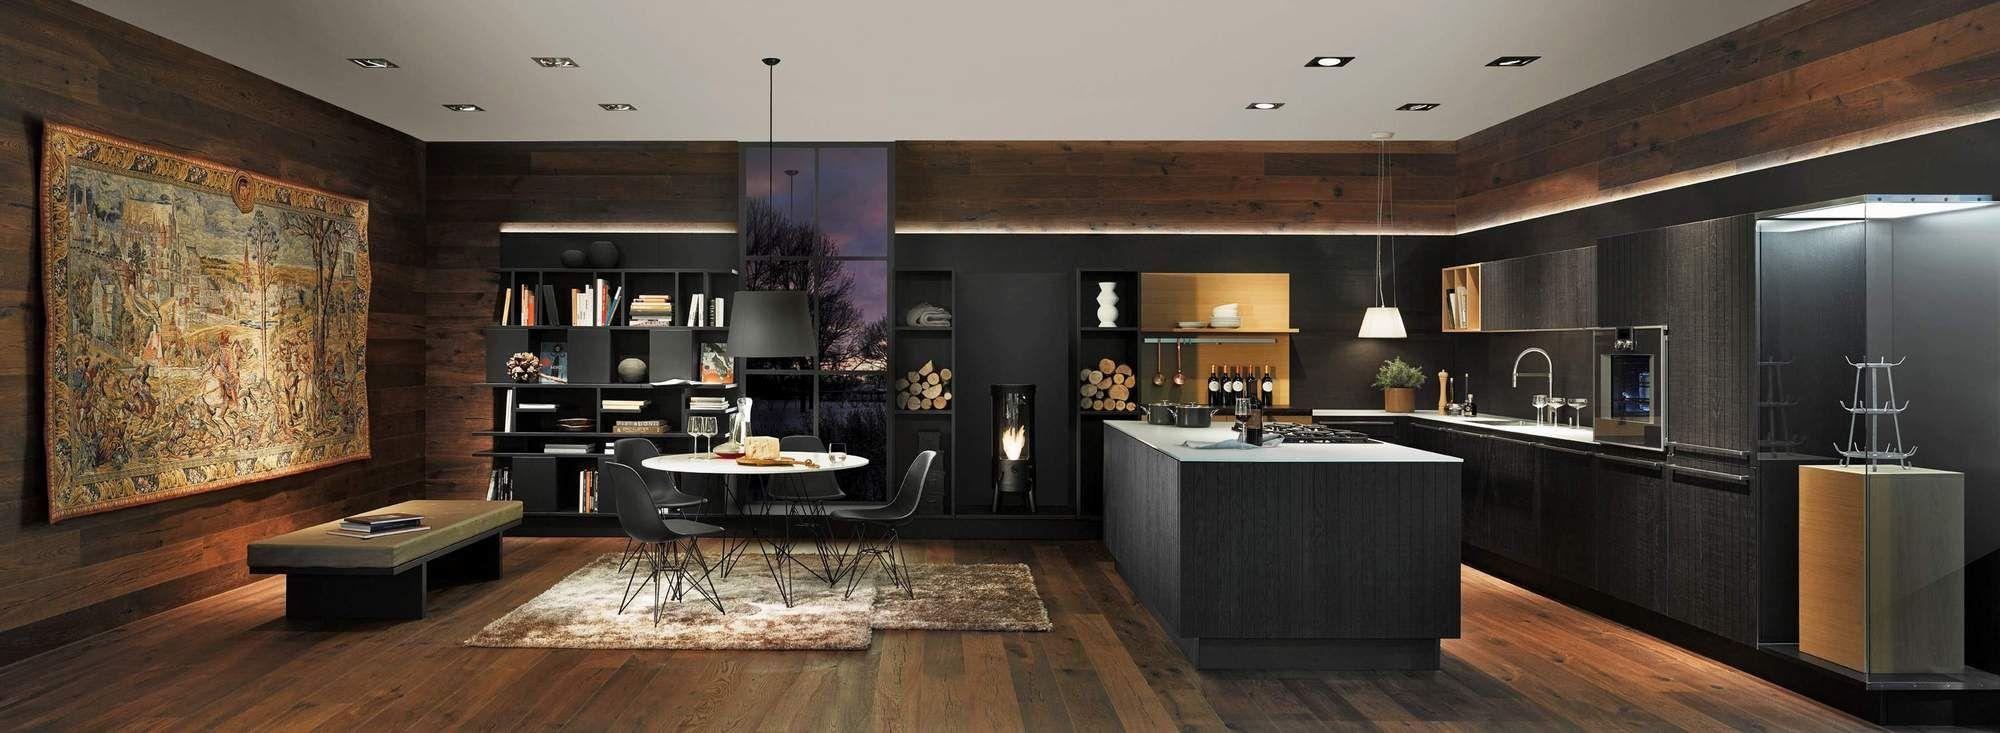 Risultati immagini per cucine di lusso italiane | Cucine | Pinterest ...